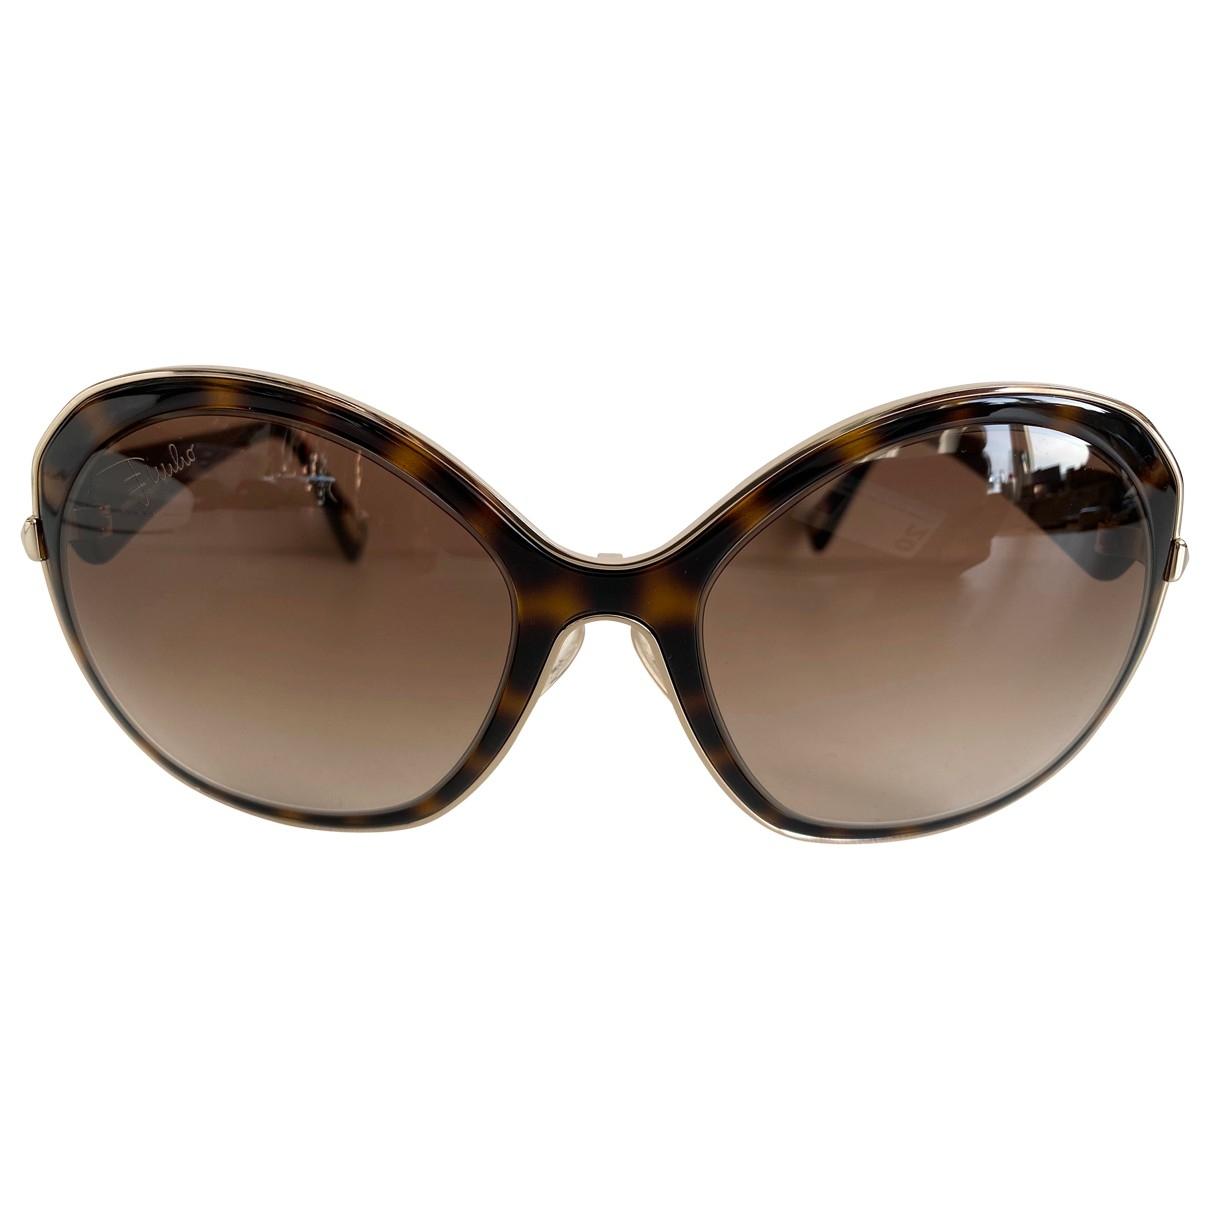 Emilio Pucci \N Brown Sunglasses for Women \N